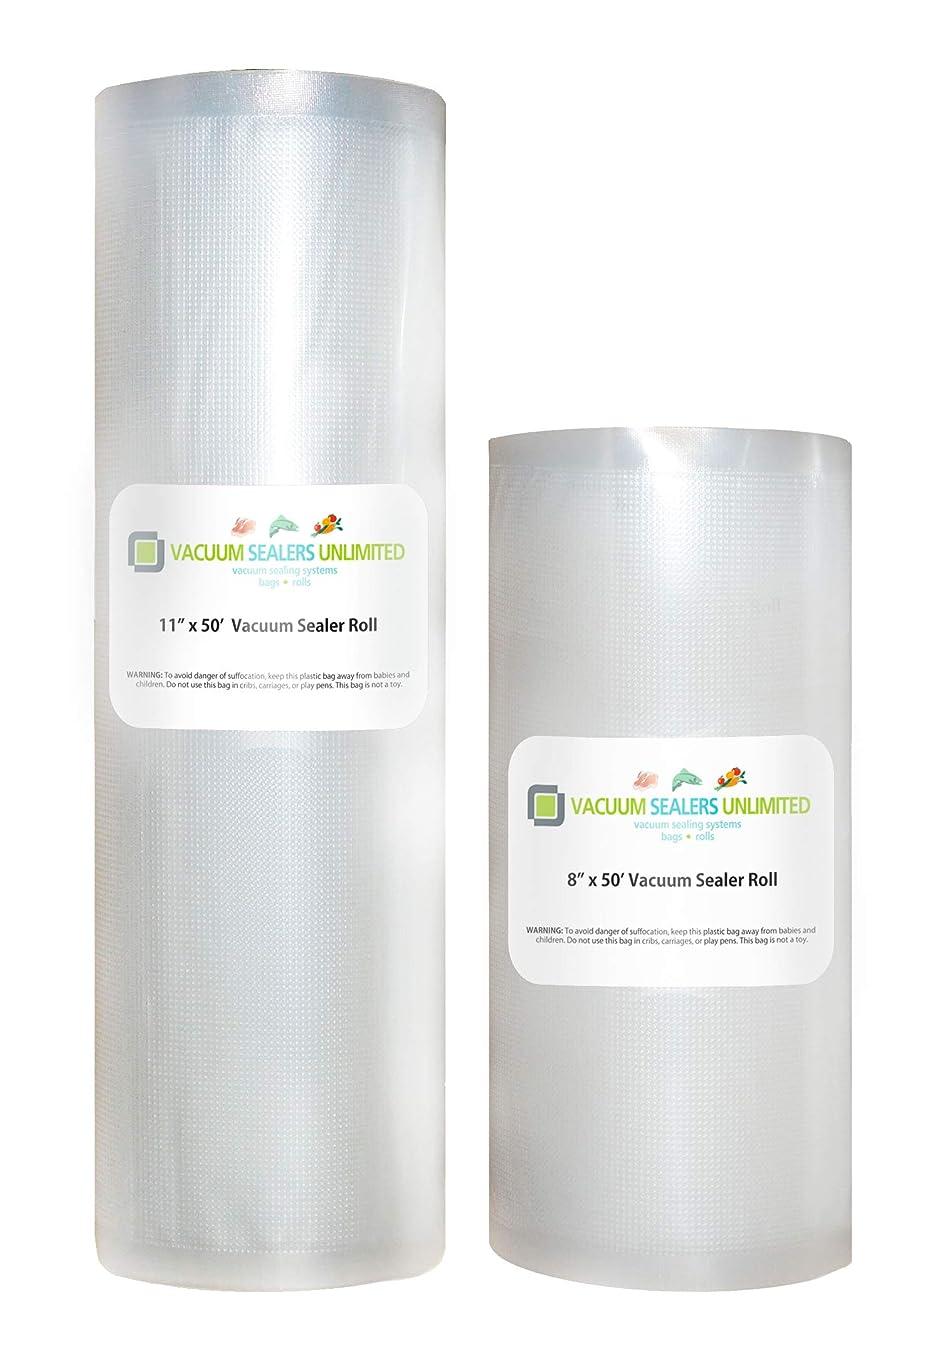 Vacuum Sealers Unlimited - Two 50 Foot Rolls (1-8